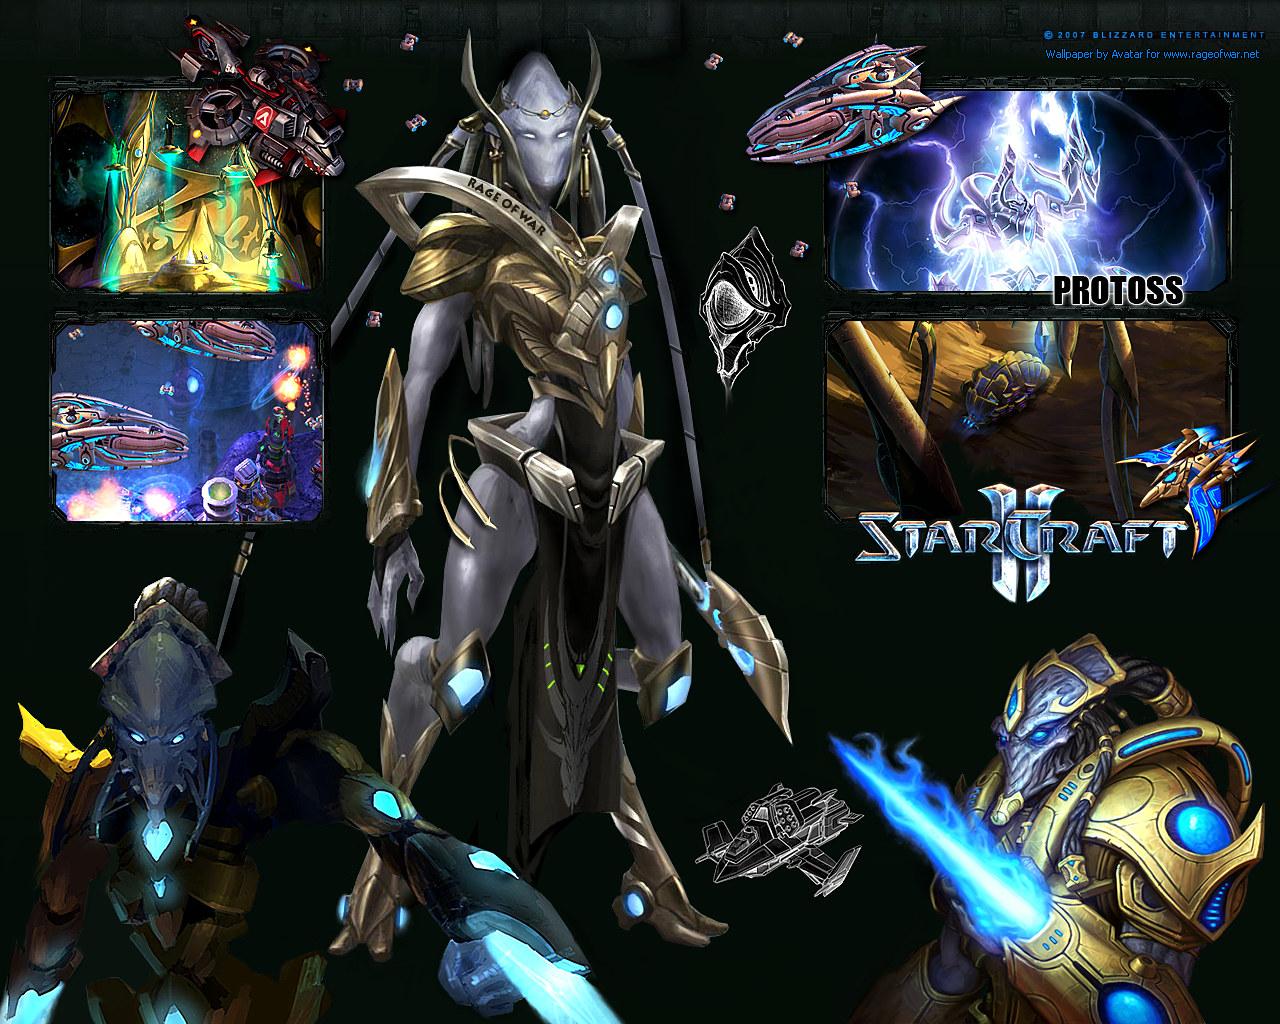 Starcraft 2 Starcraft-2-wallpaper